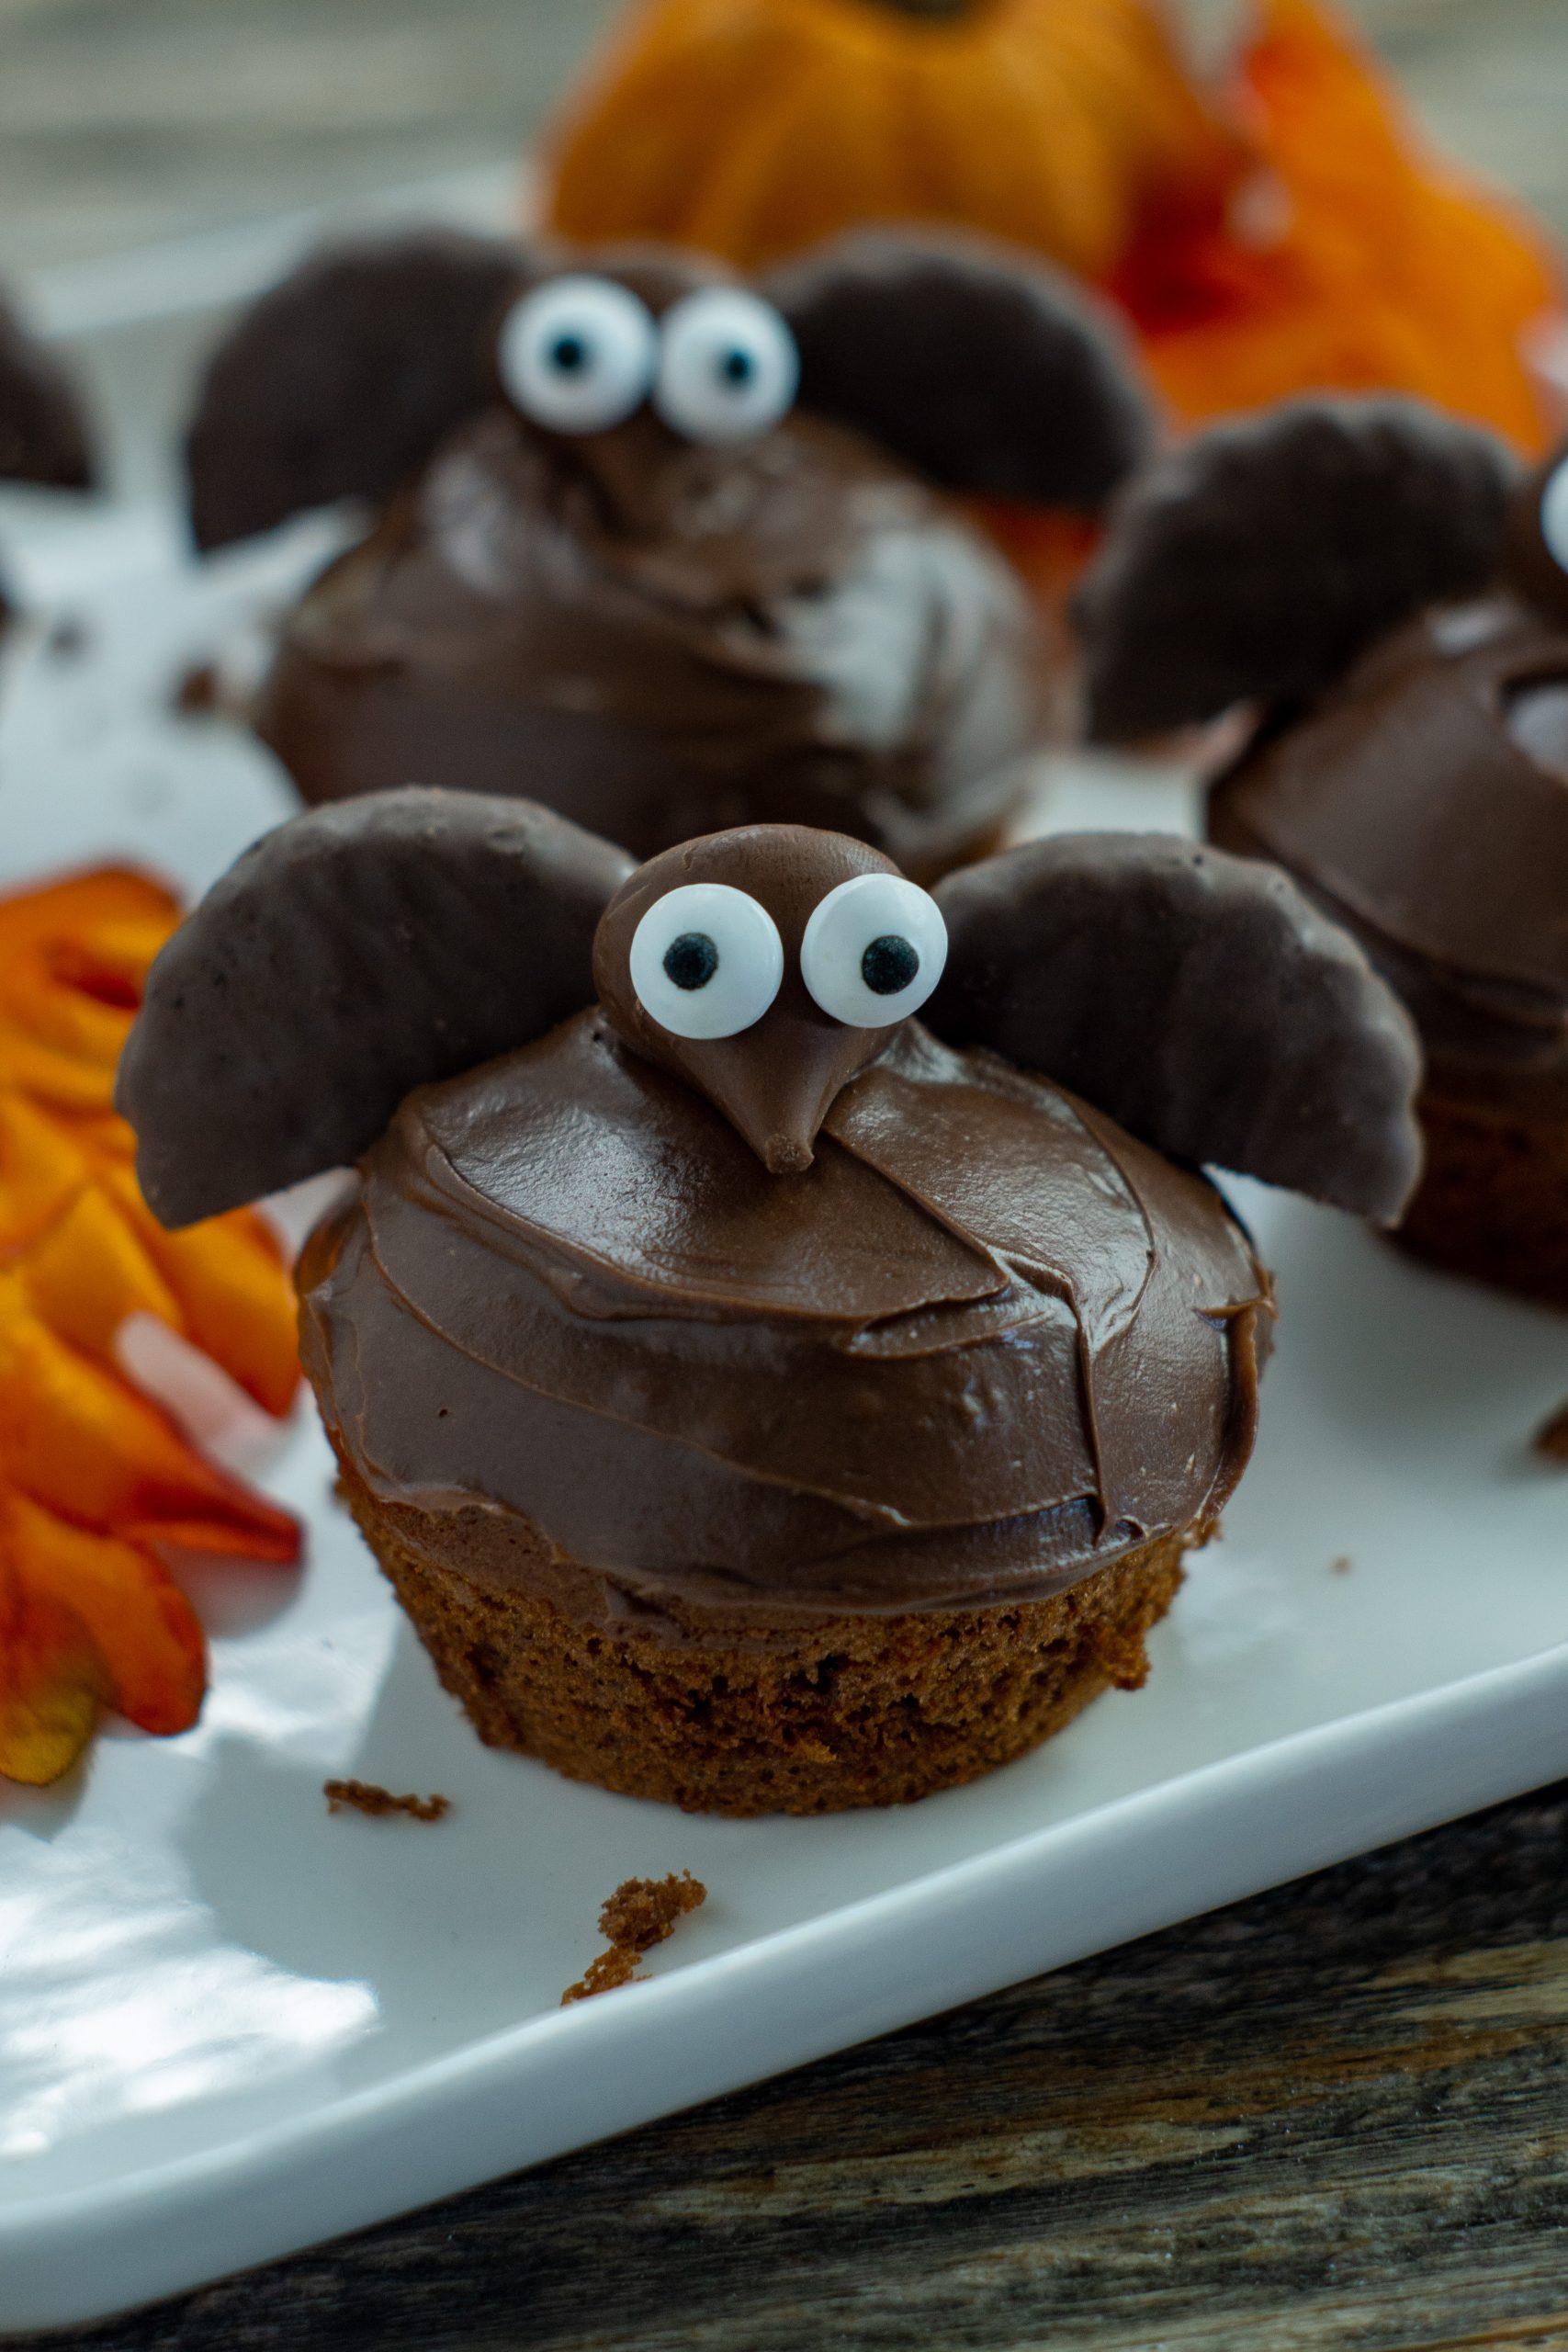 Halloween Bat Cupcakes.Semi Homemade Bat Cupcakes For Halloween About A Mom